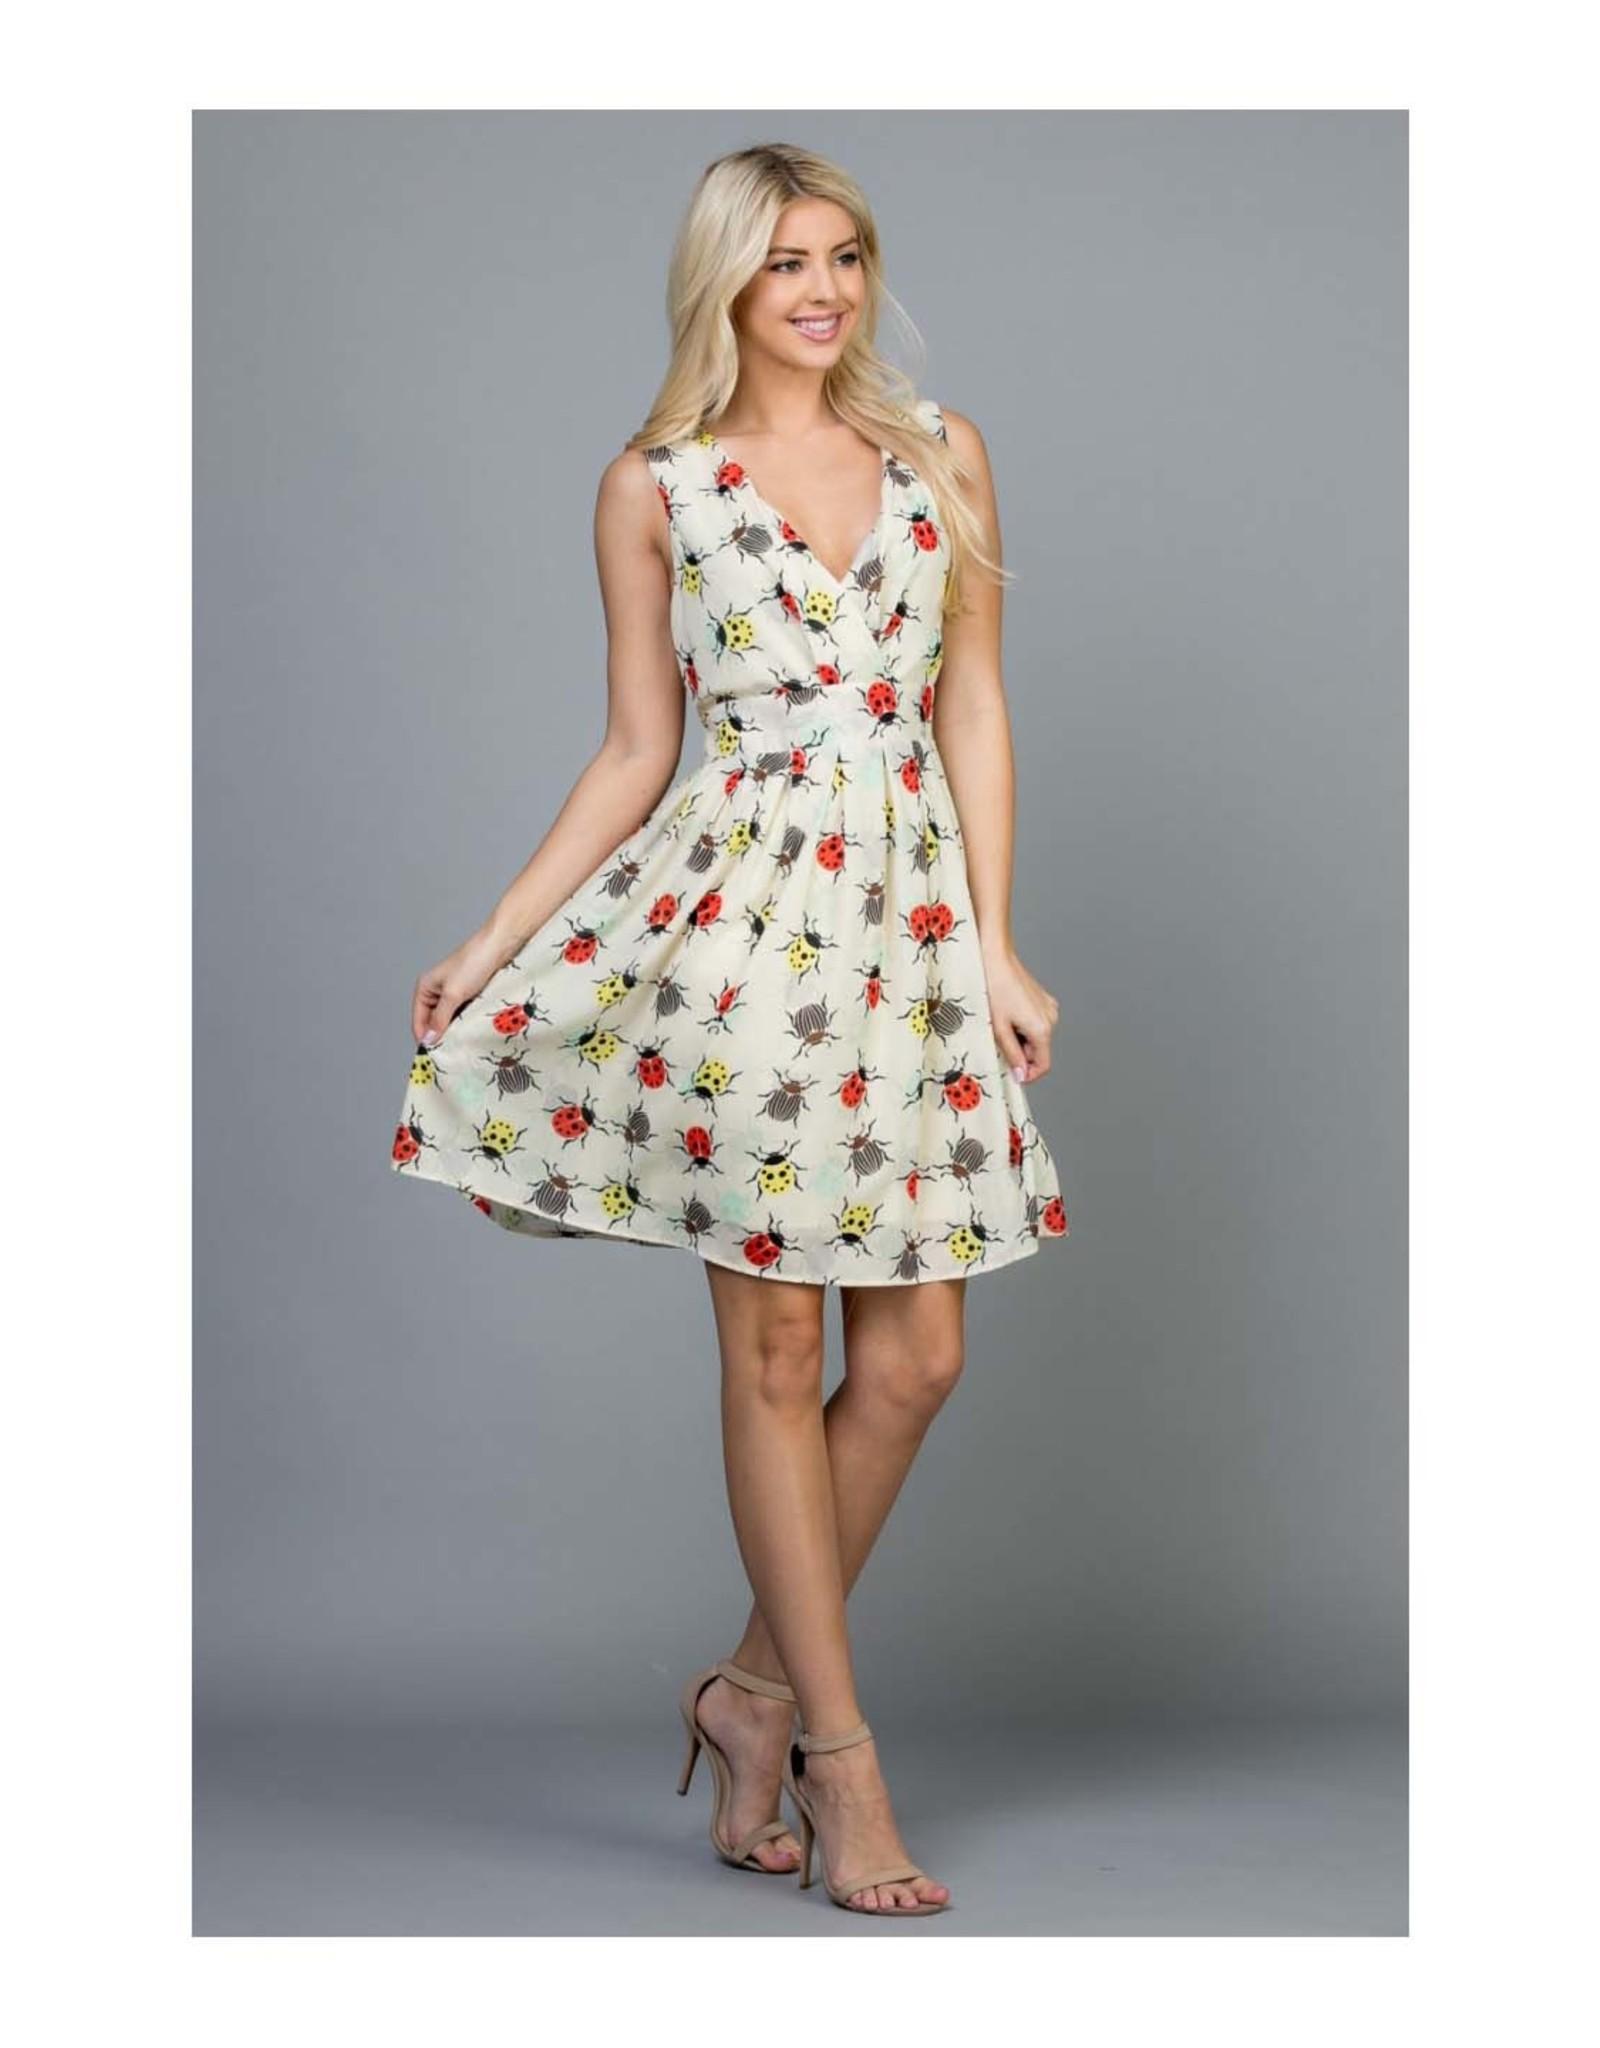 Bugs World V-Neck Dress